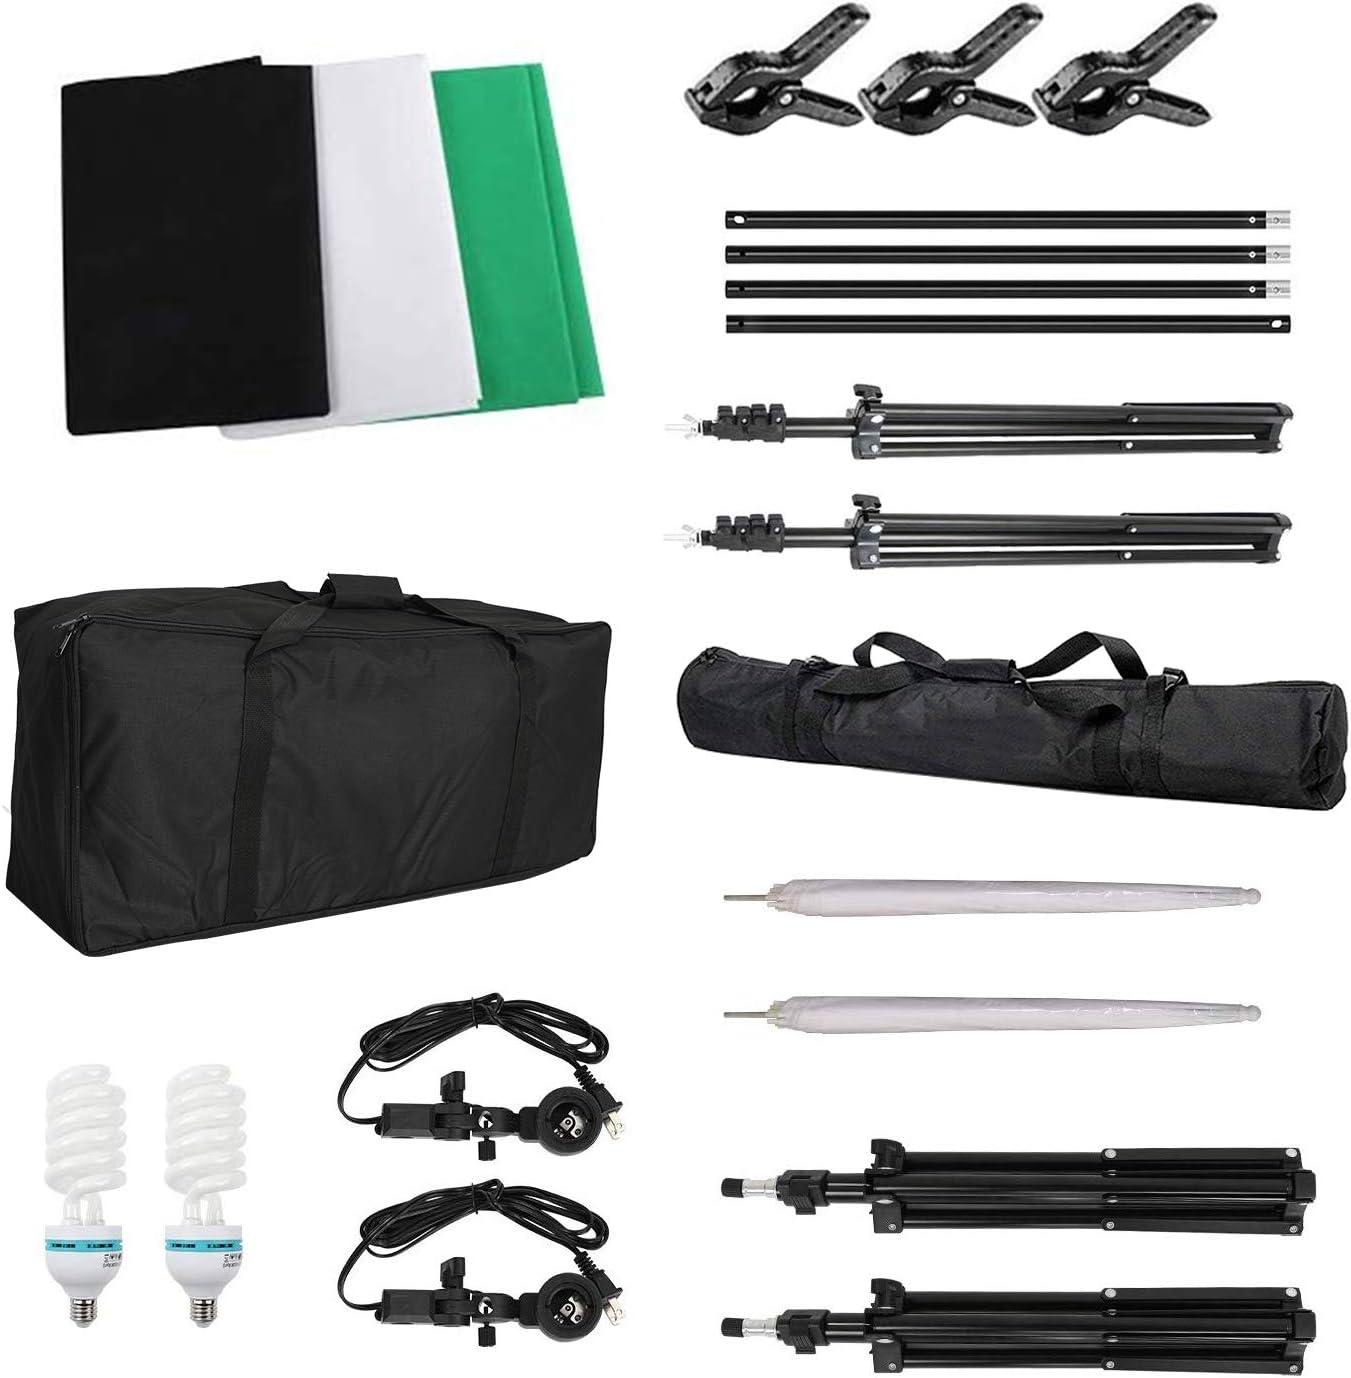 Studio Lighting Kit,6 x 9ft Backdrop Stand Kit with 3 Color Photo Backdrop and Softbox Lighting Kit Continuous Lighting Kit with Carry Bag for Photo Studio Product,Video Shooting